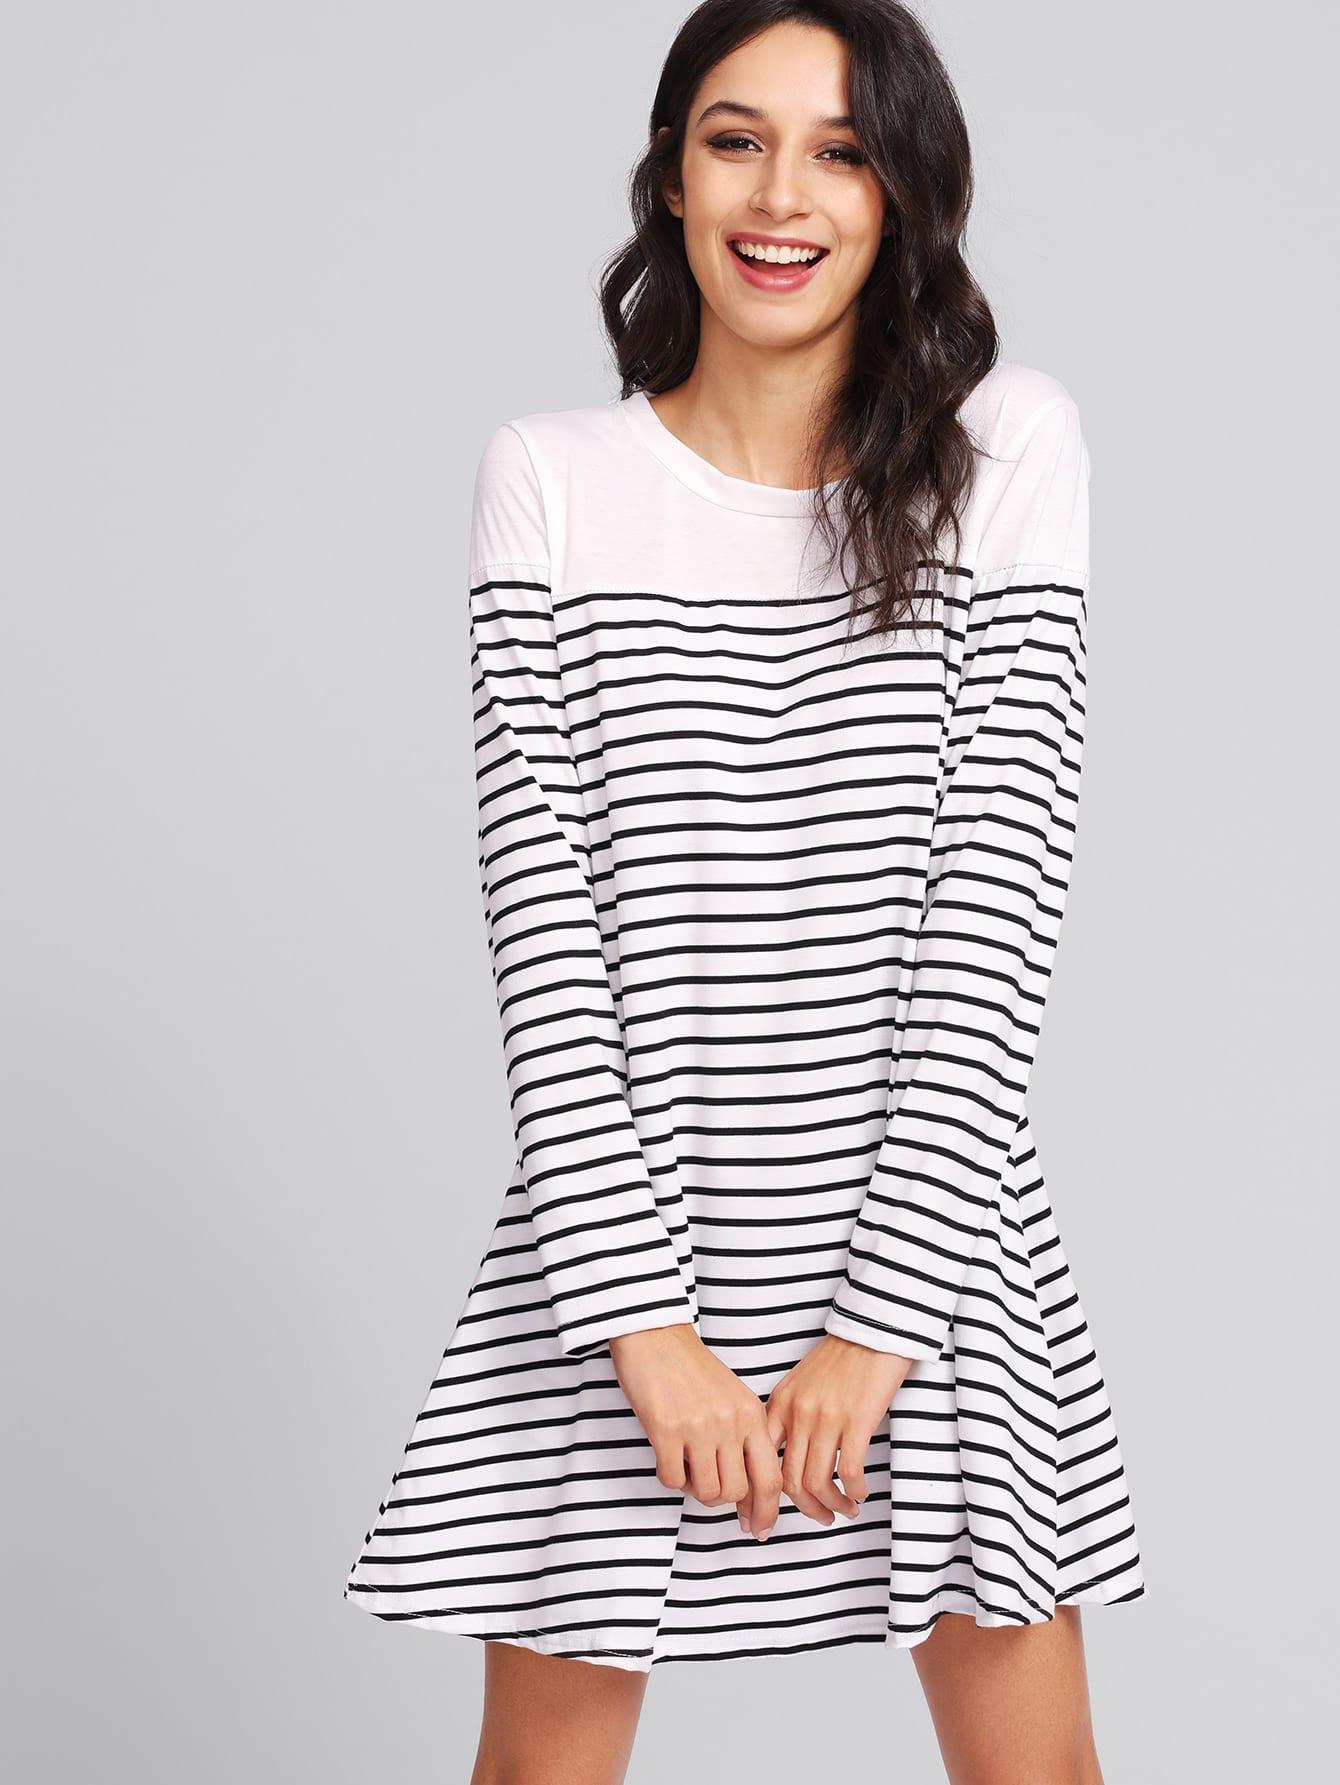 Contrast Striped Tee Dress anex 20483